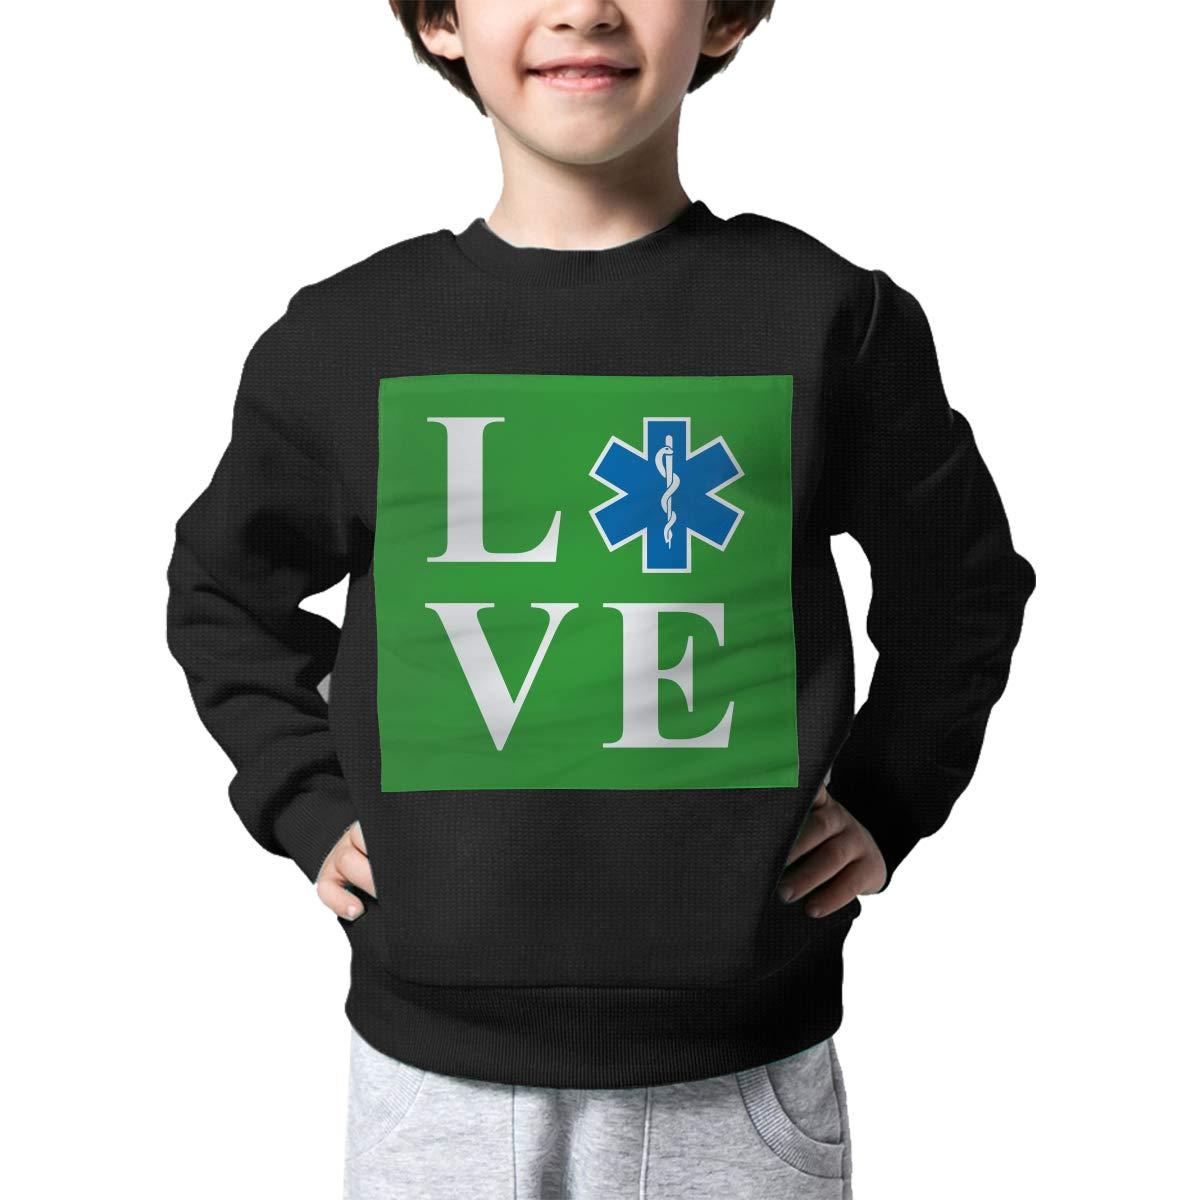 Childrens Love EMT Sweater Baby Girls Printed Sweater